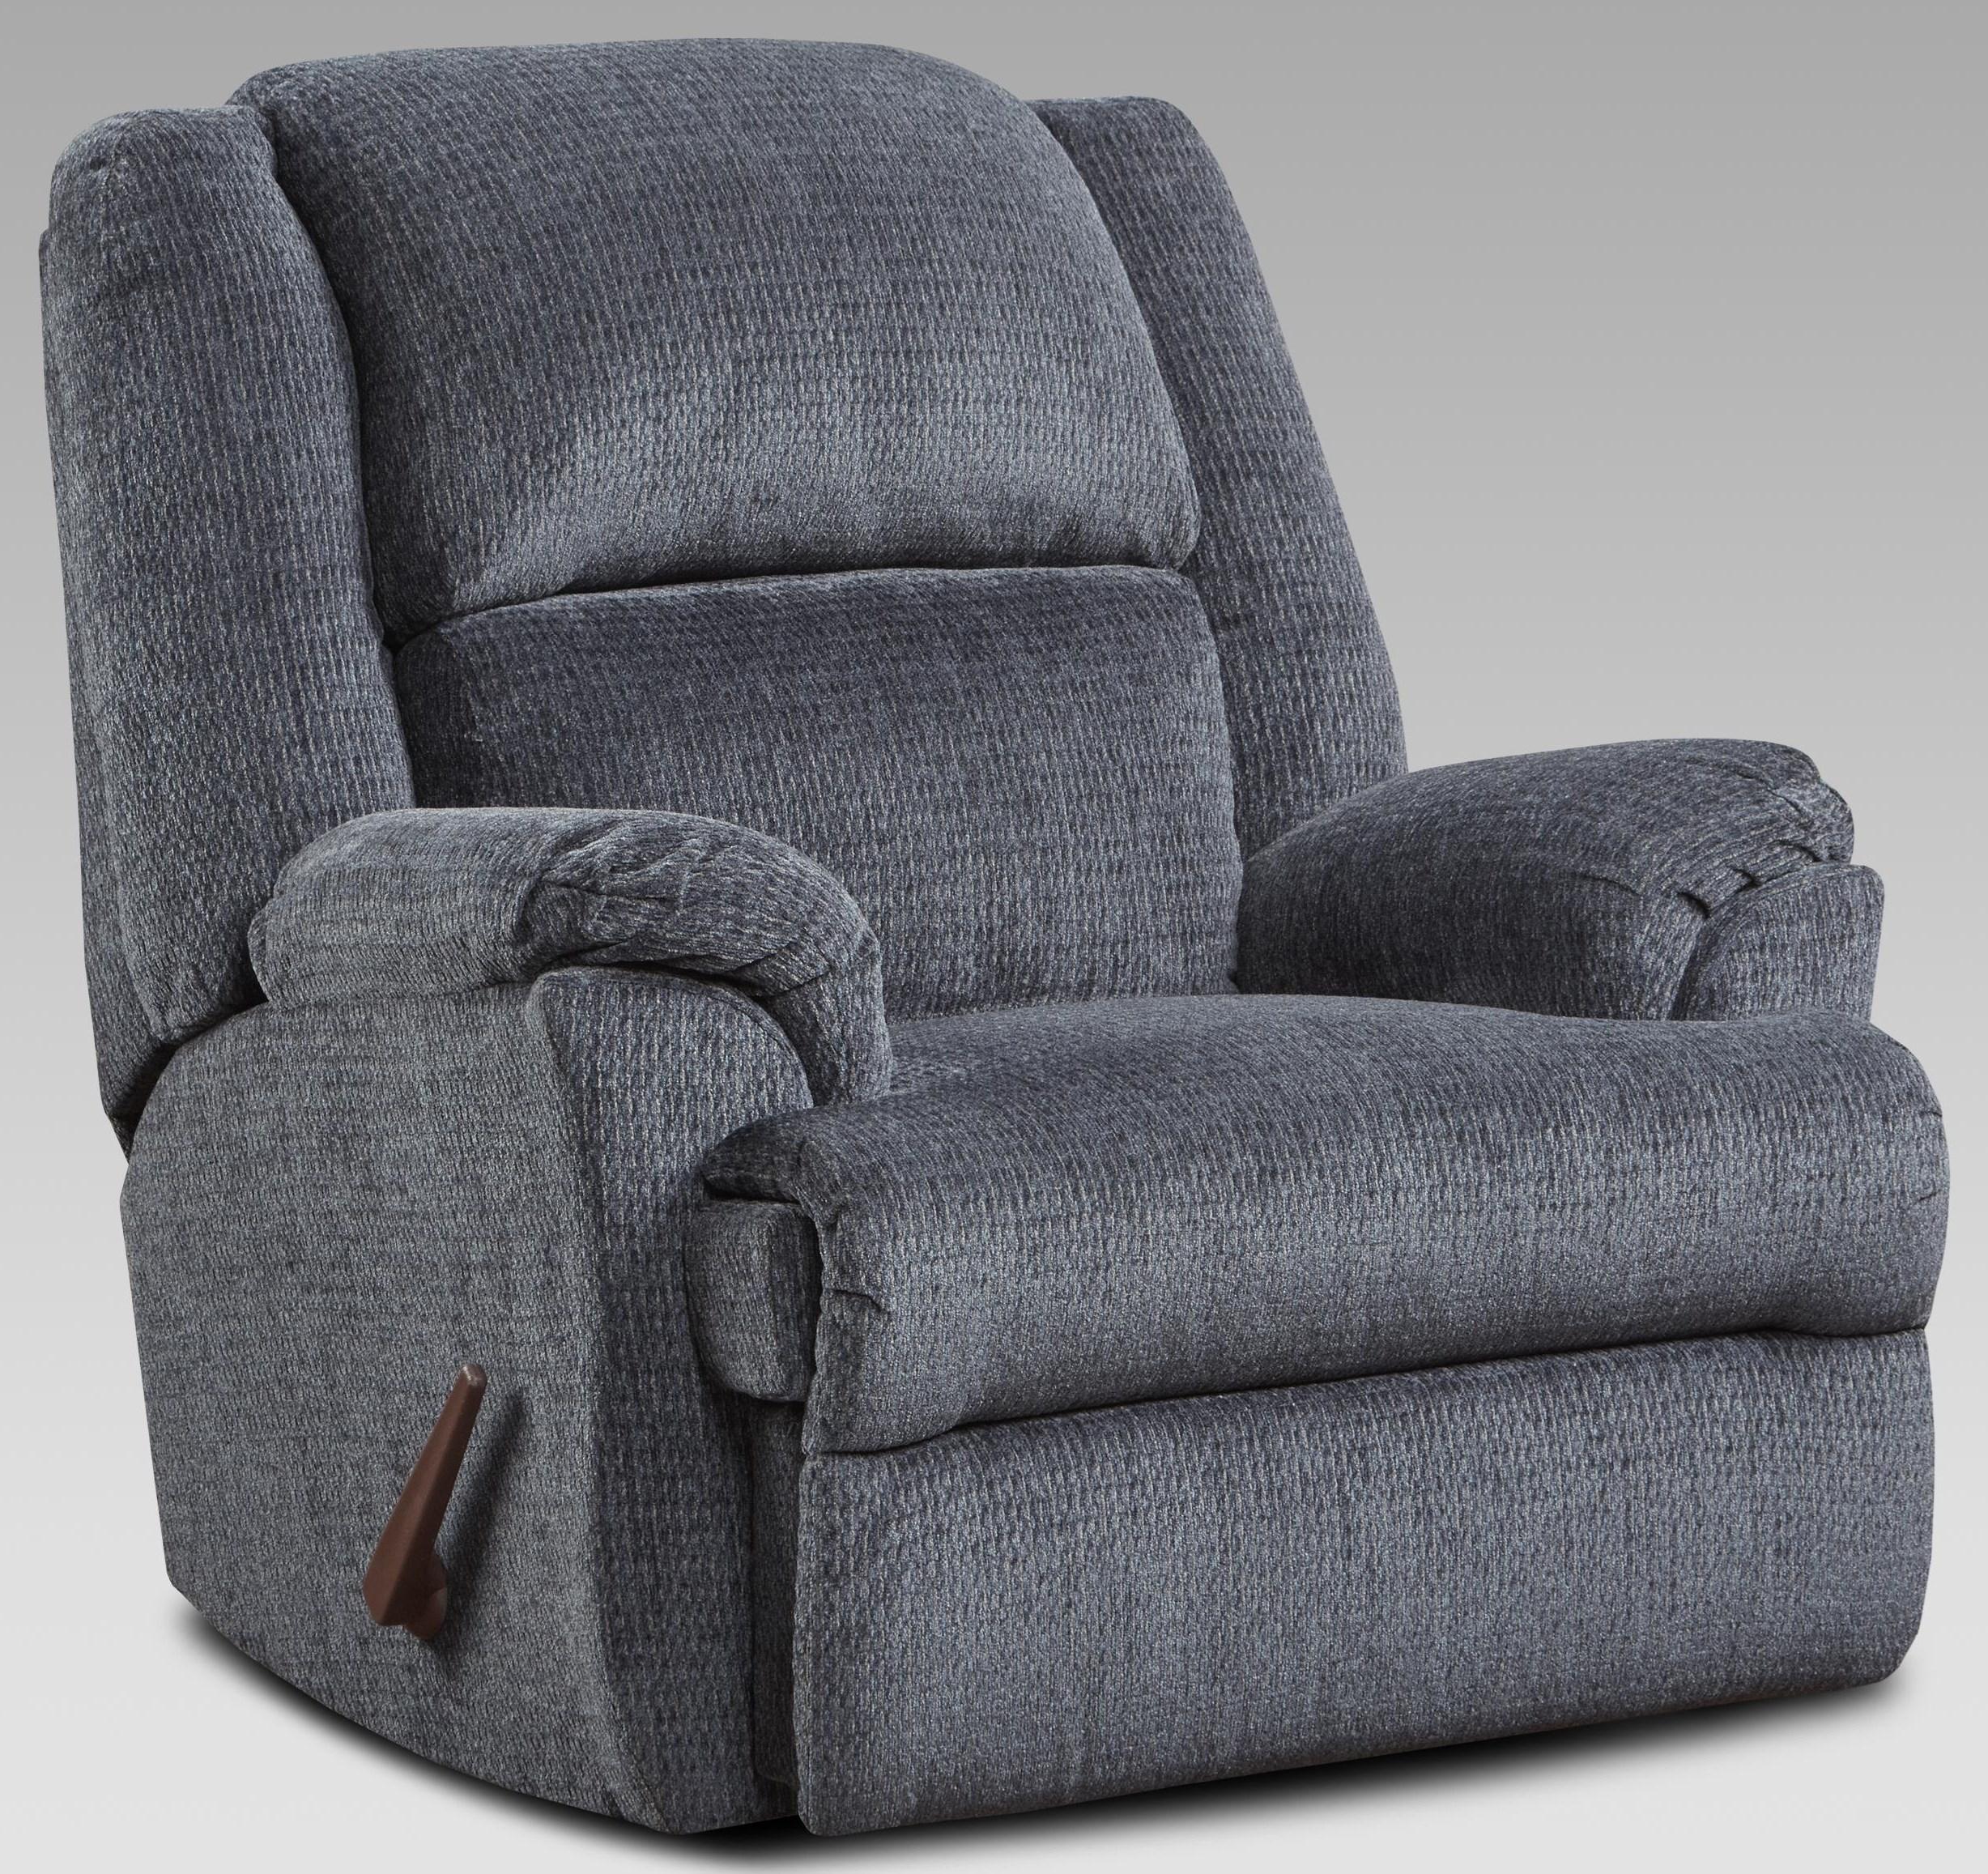 2600 2600 INDIGO RECLINER by Affordable Furniture at Furniture Fair - North Carolina